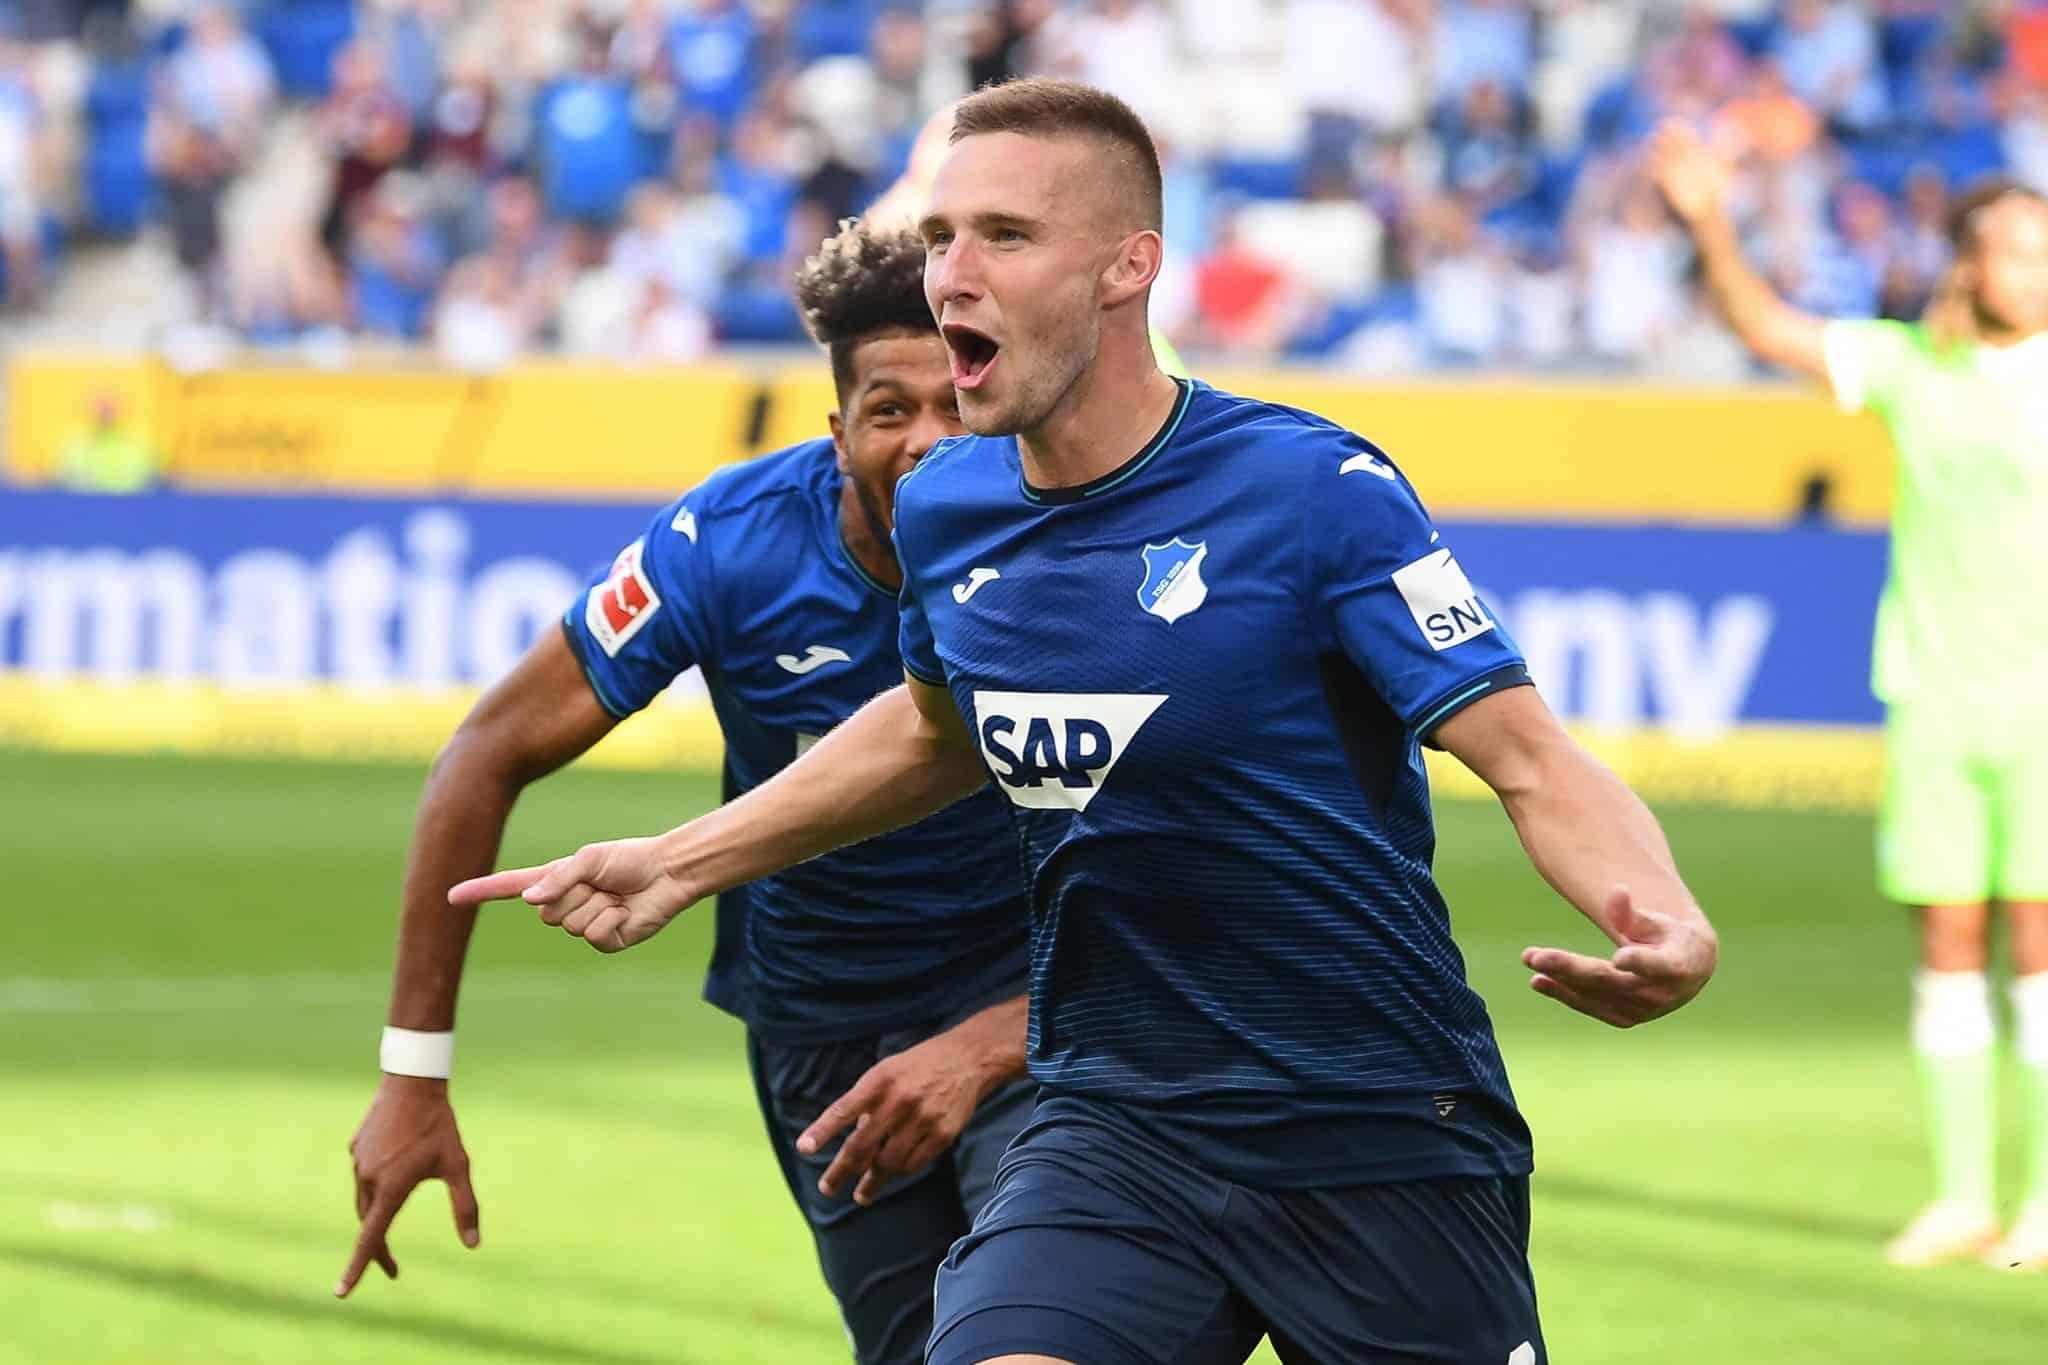 Ponturi pariuri VfB Stuttgart vs Hoffenheim